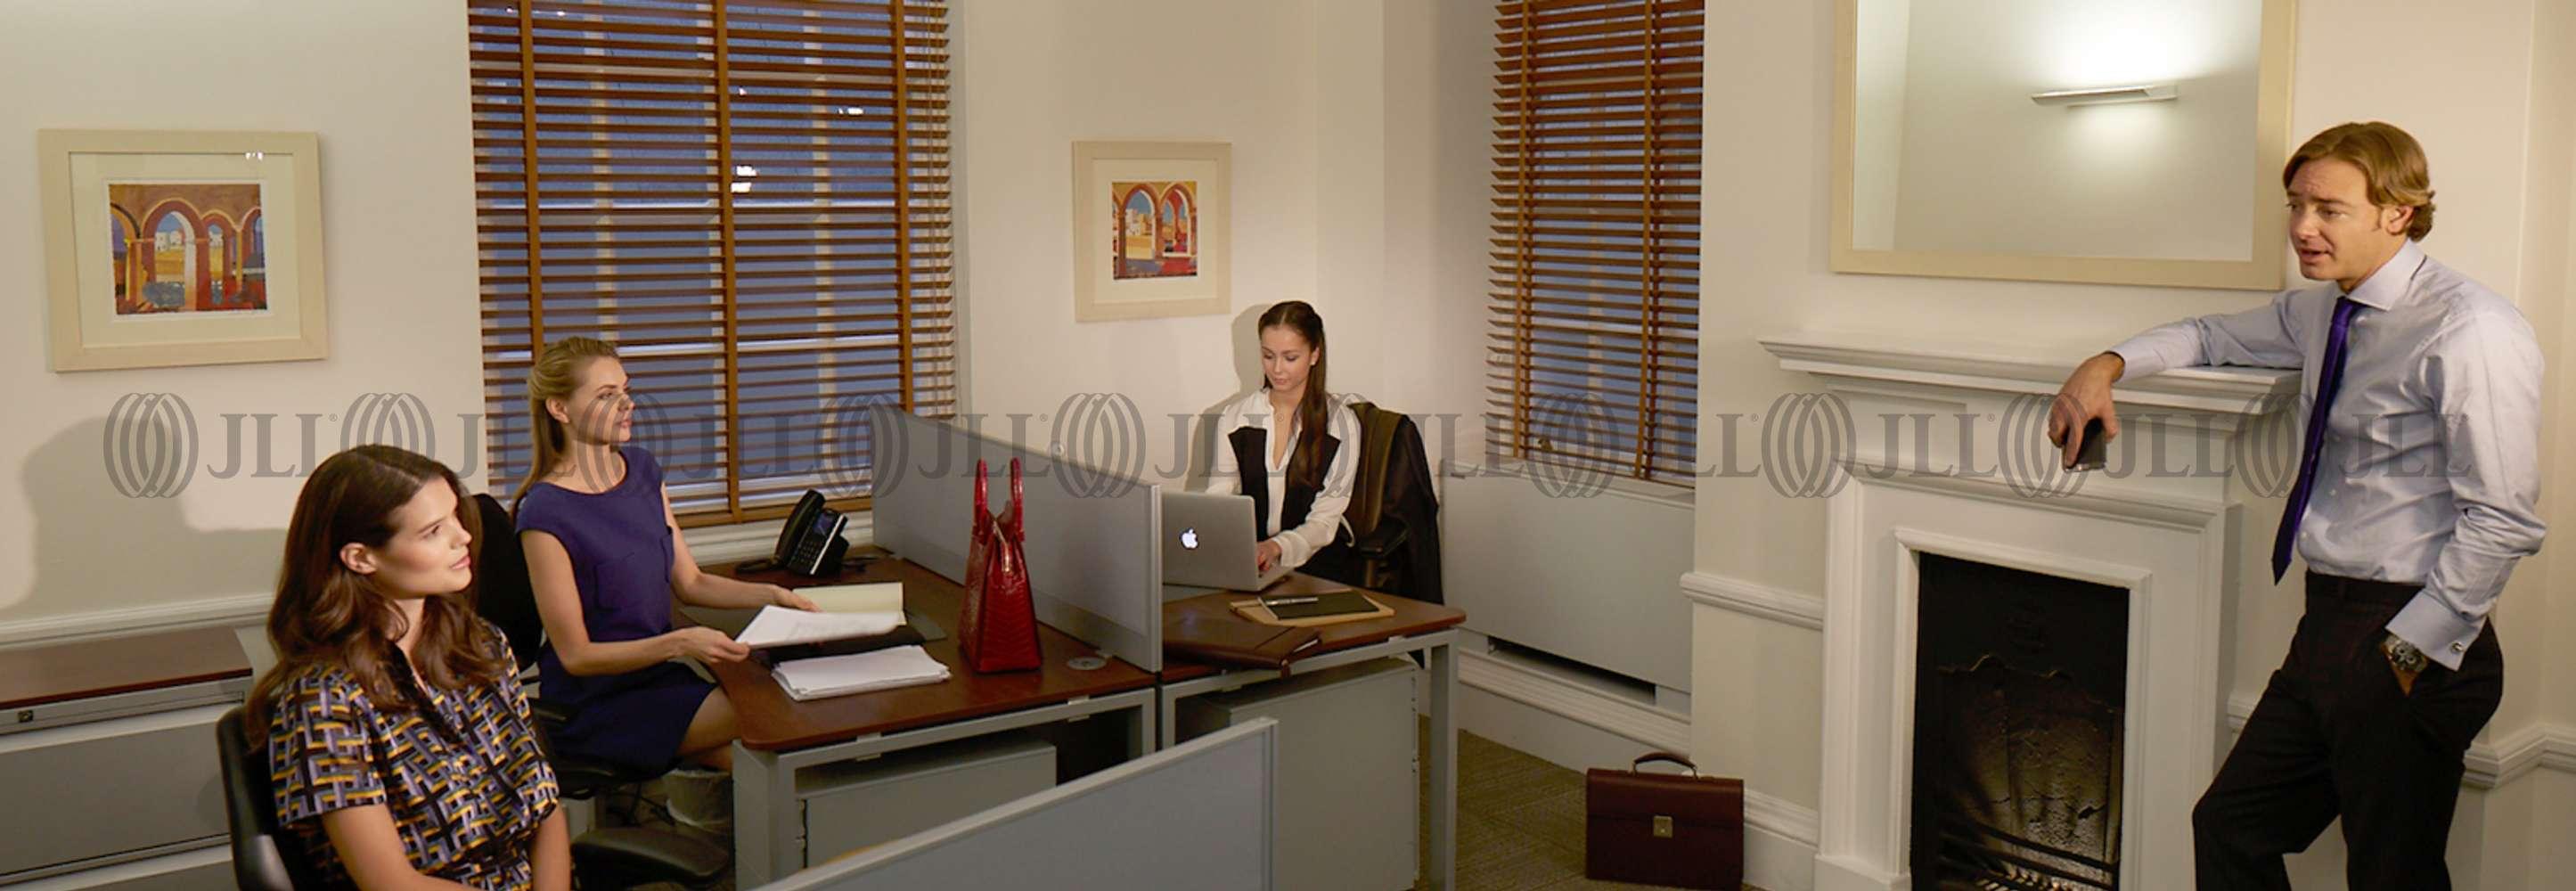 Serviced office London, WC2E 7PP - Hudson House